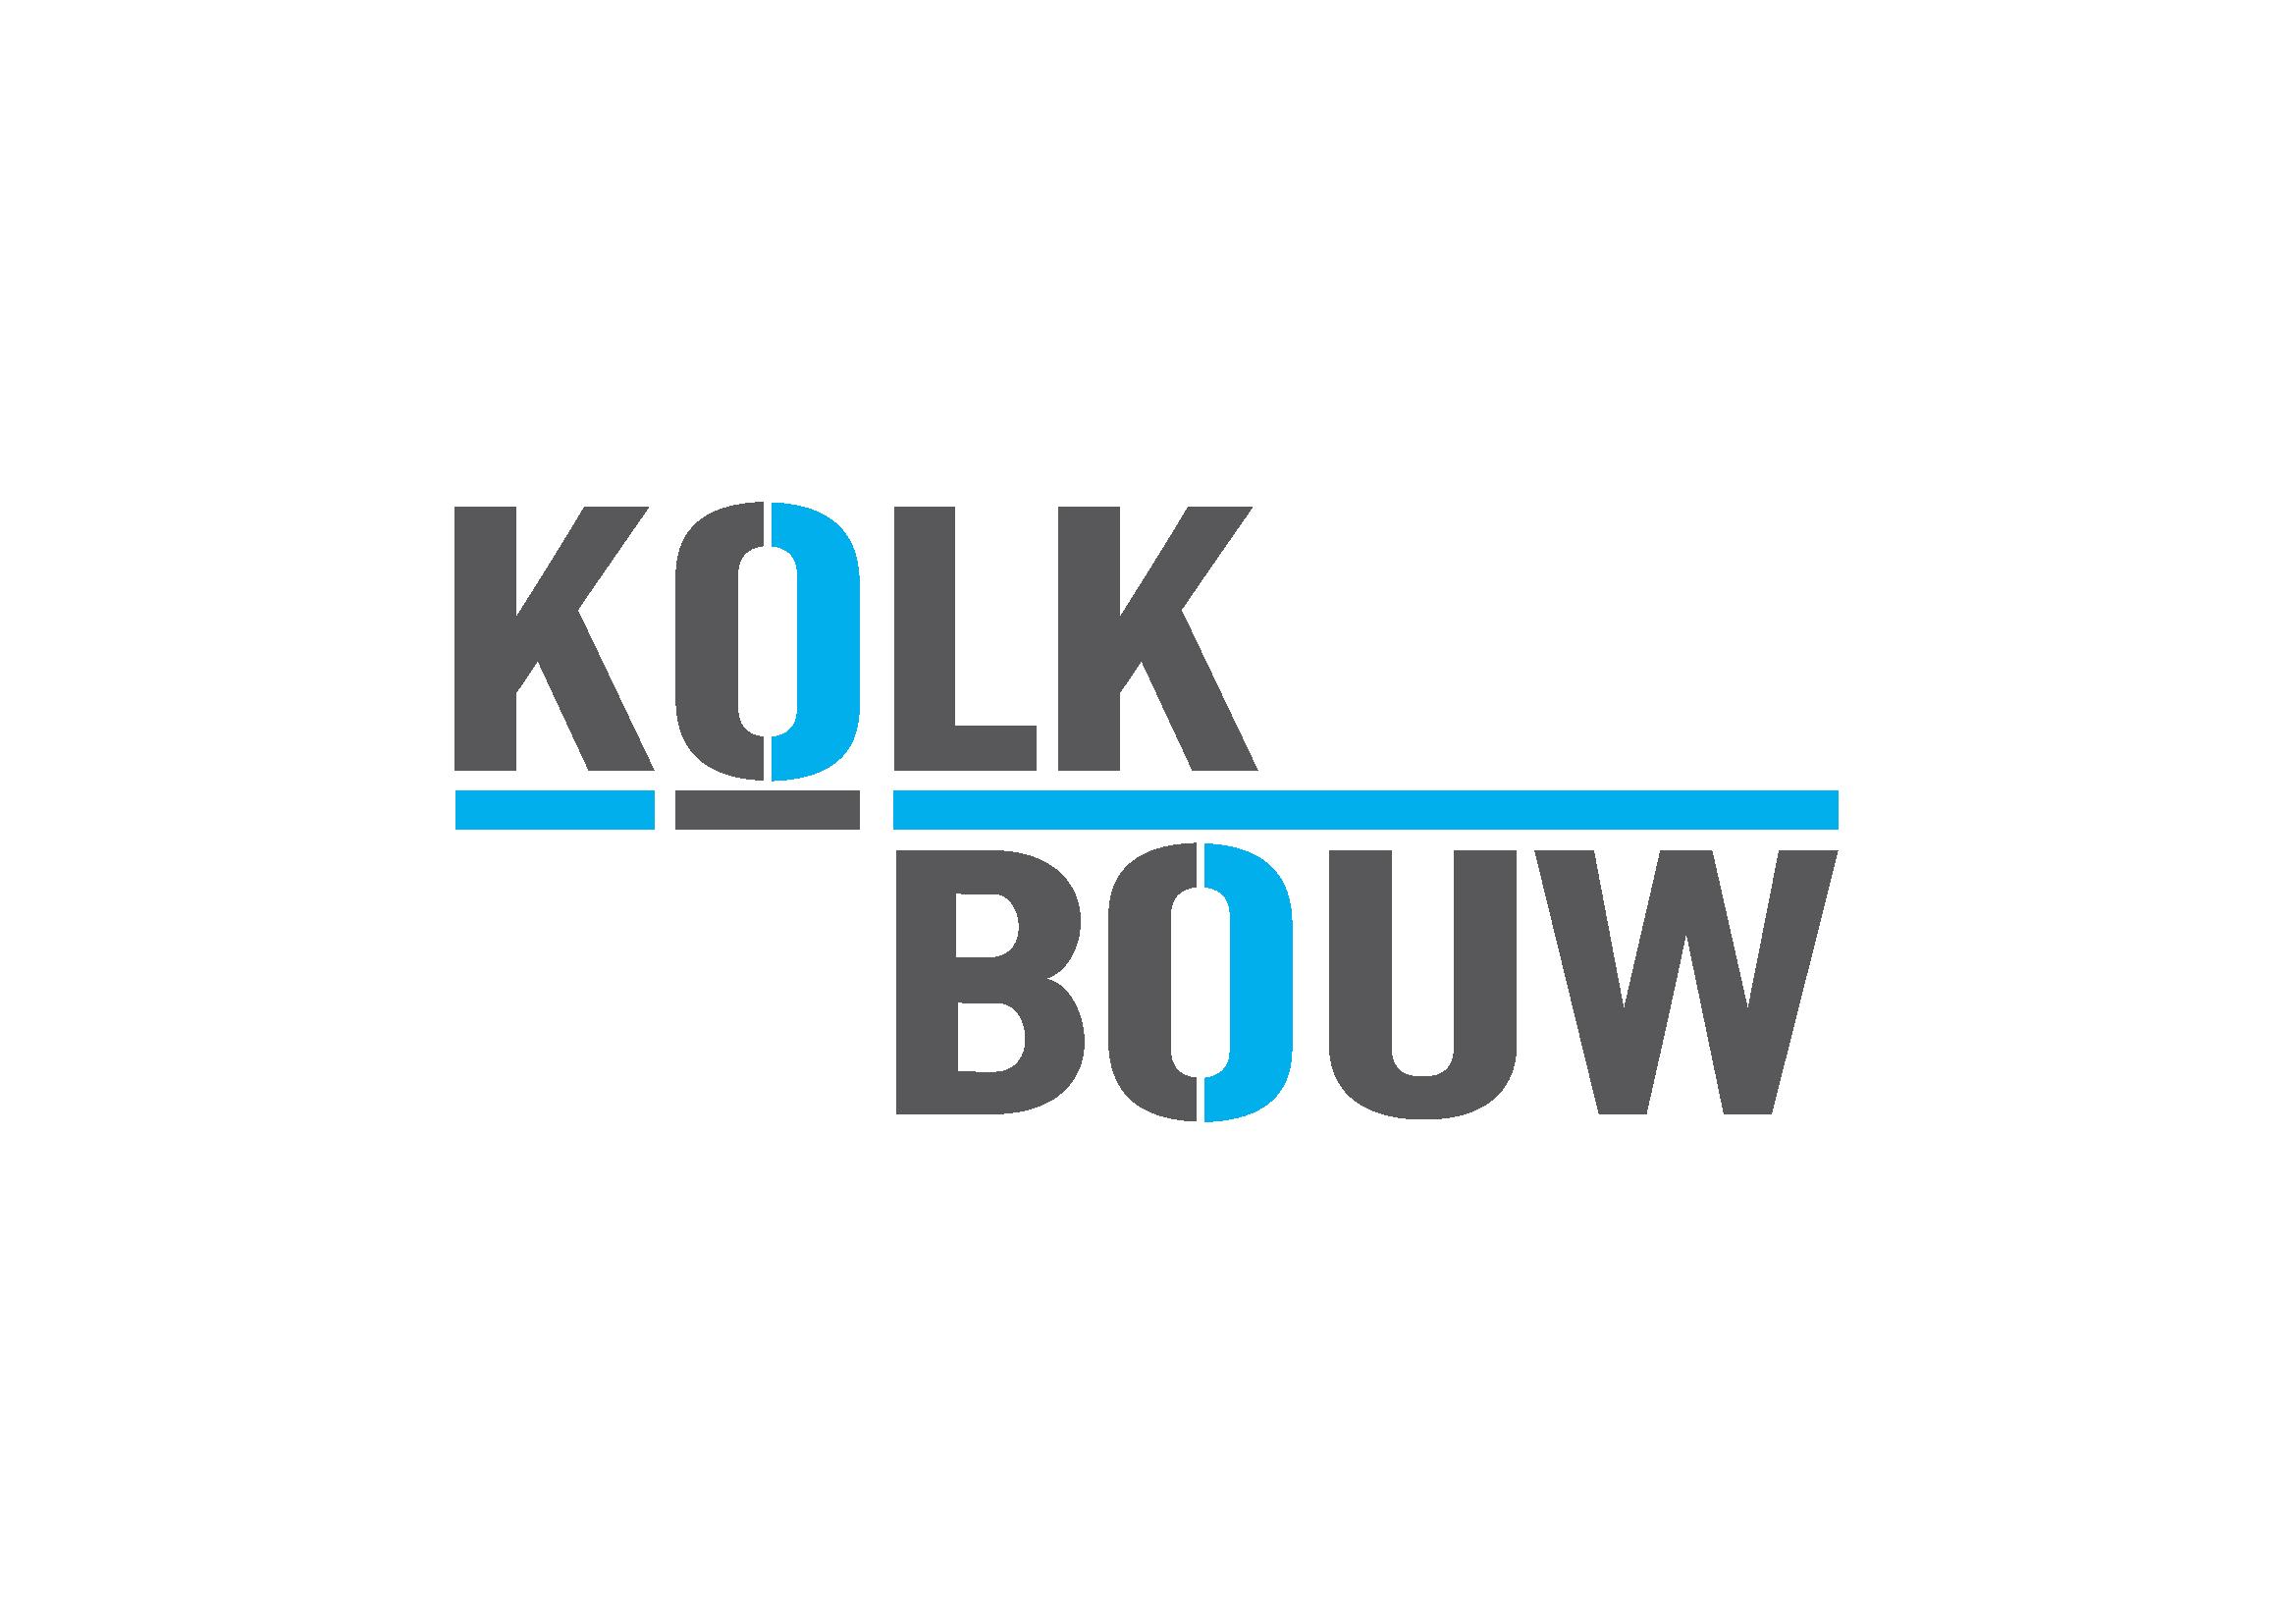 12 KolkBouw - logo